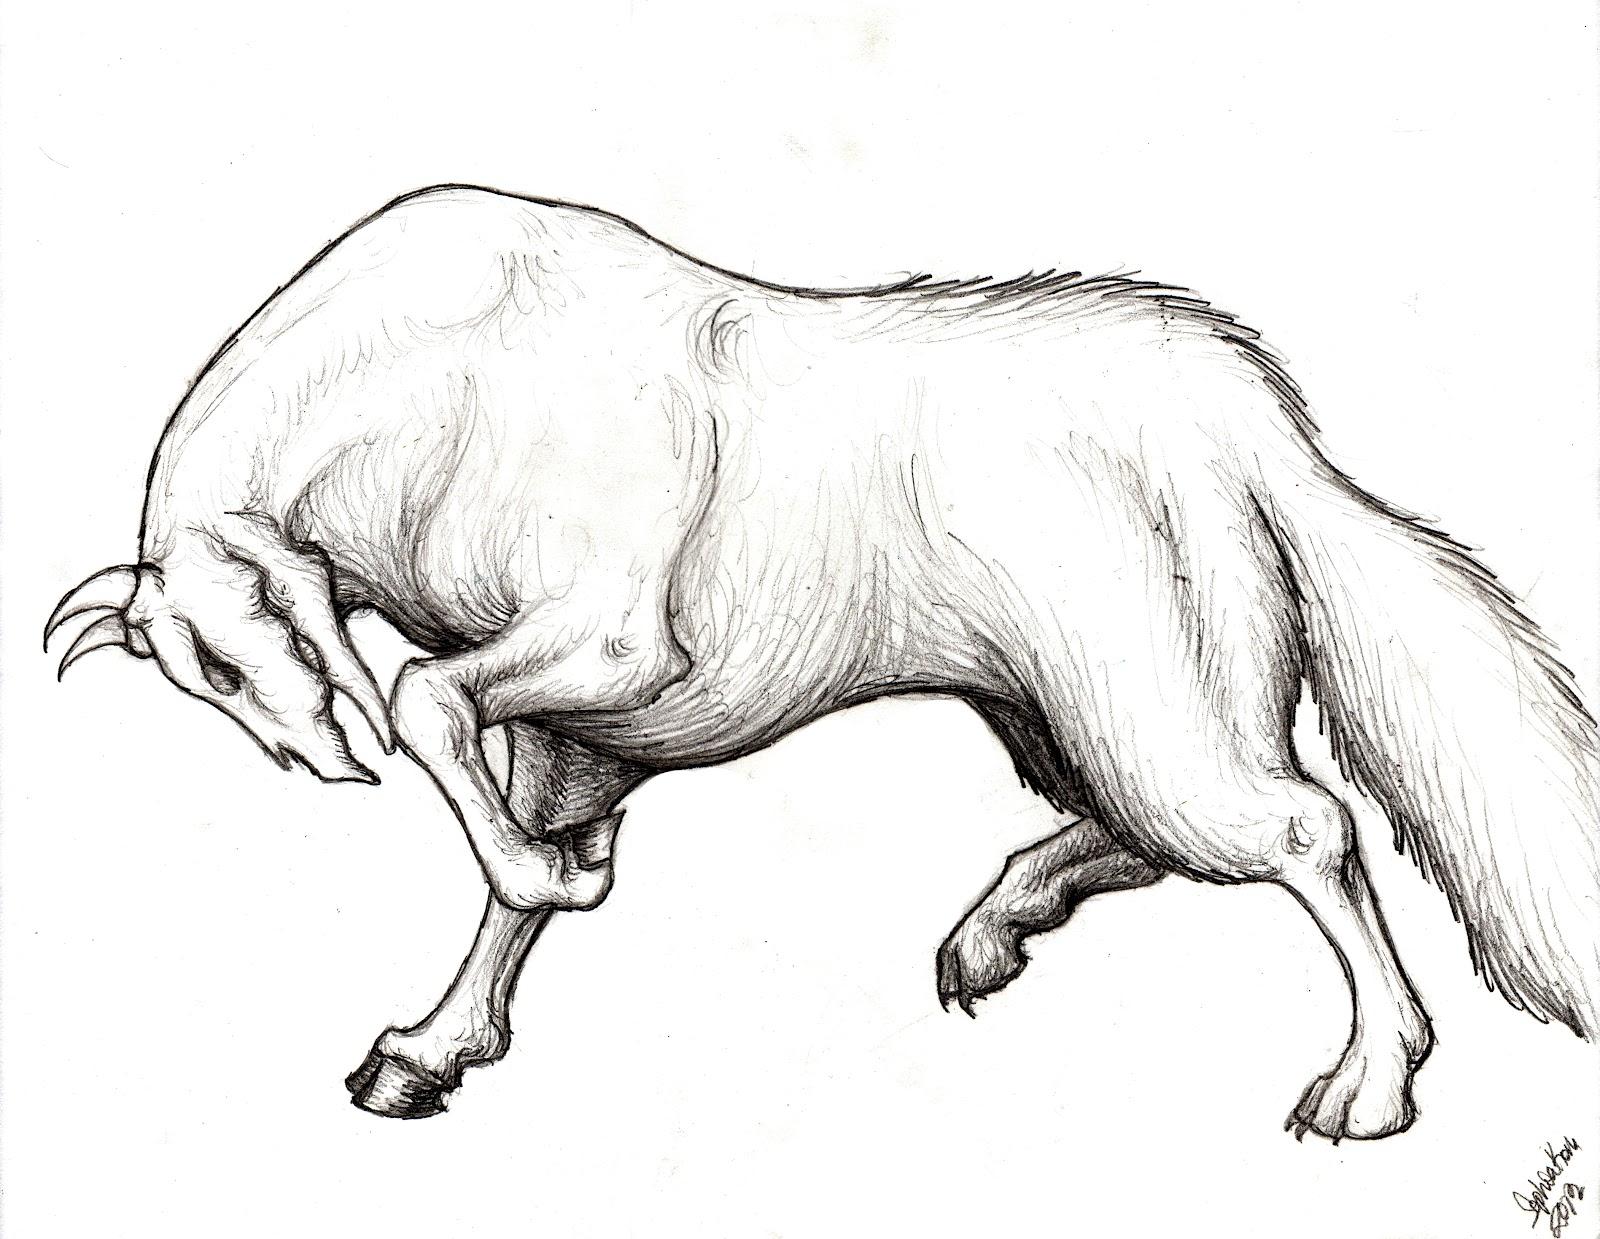 Matarlovine--giant wolf with the head of a skeletal bull--My idea